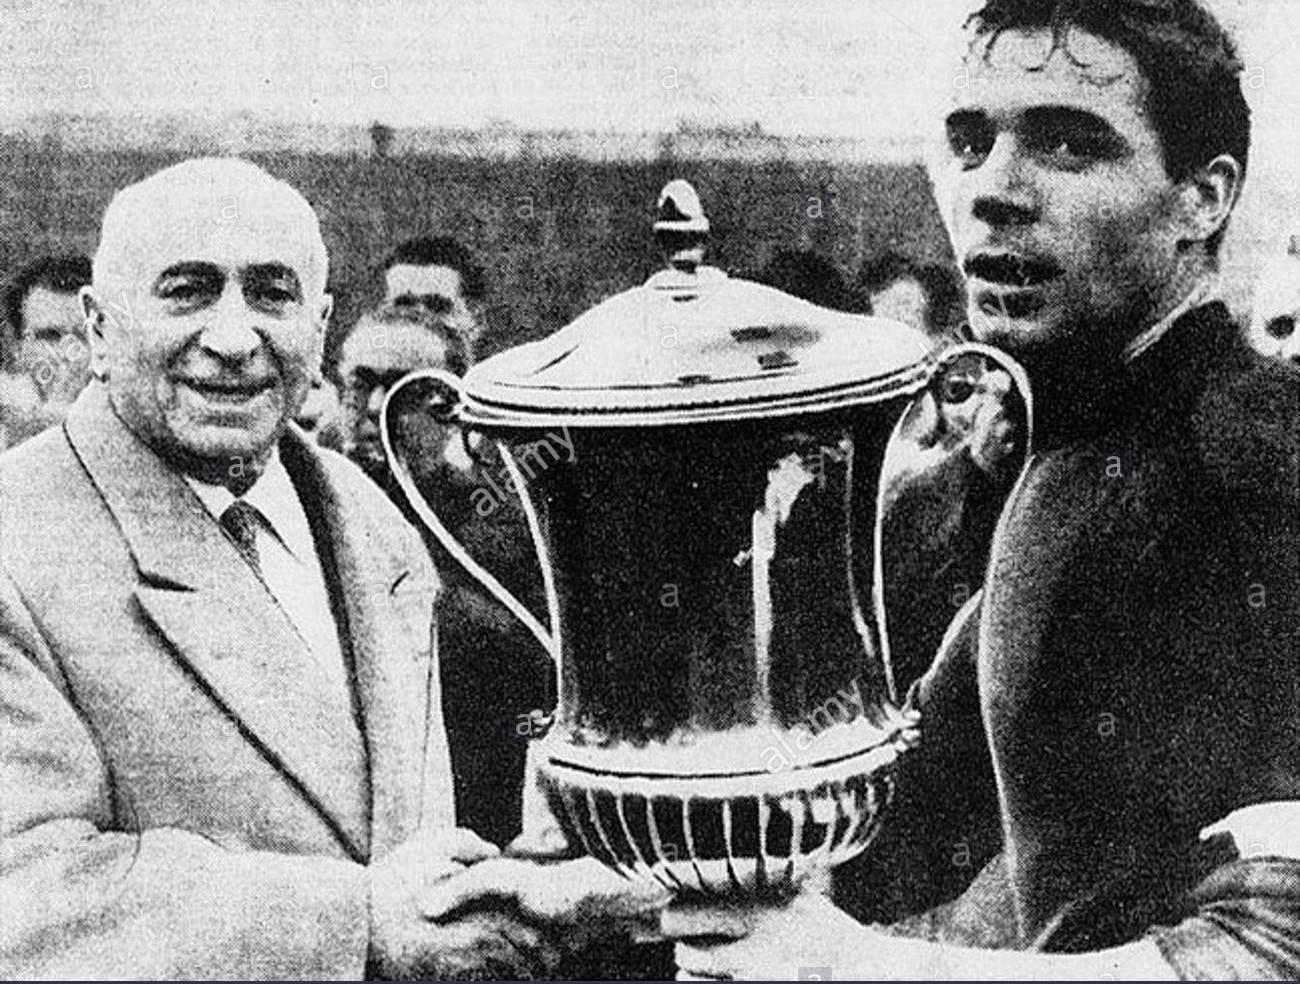 mitropa_cup.jpg (389.63 Kb)